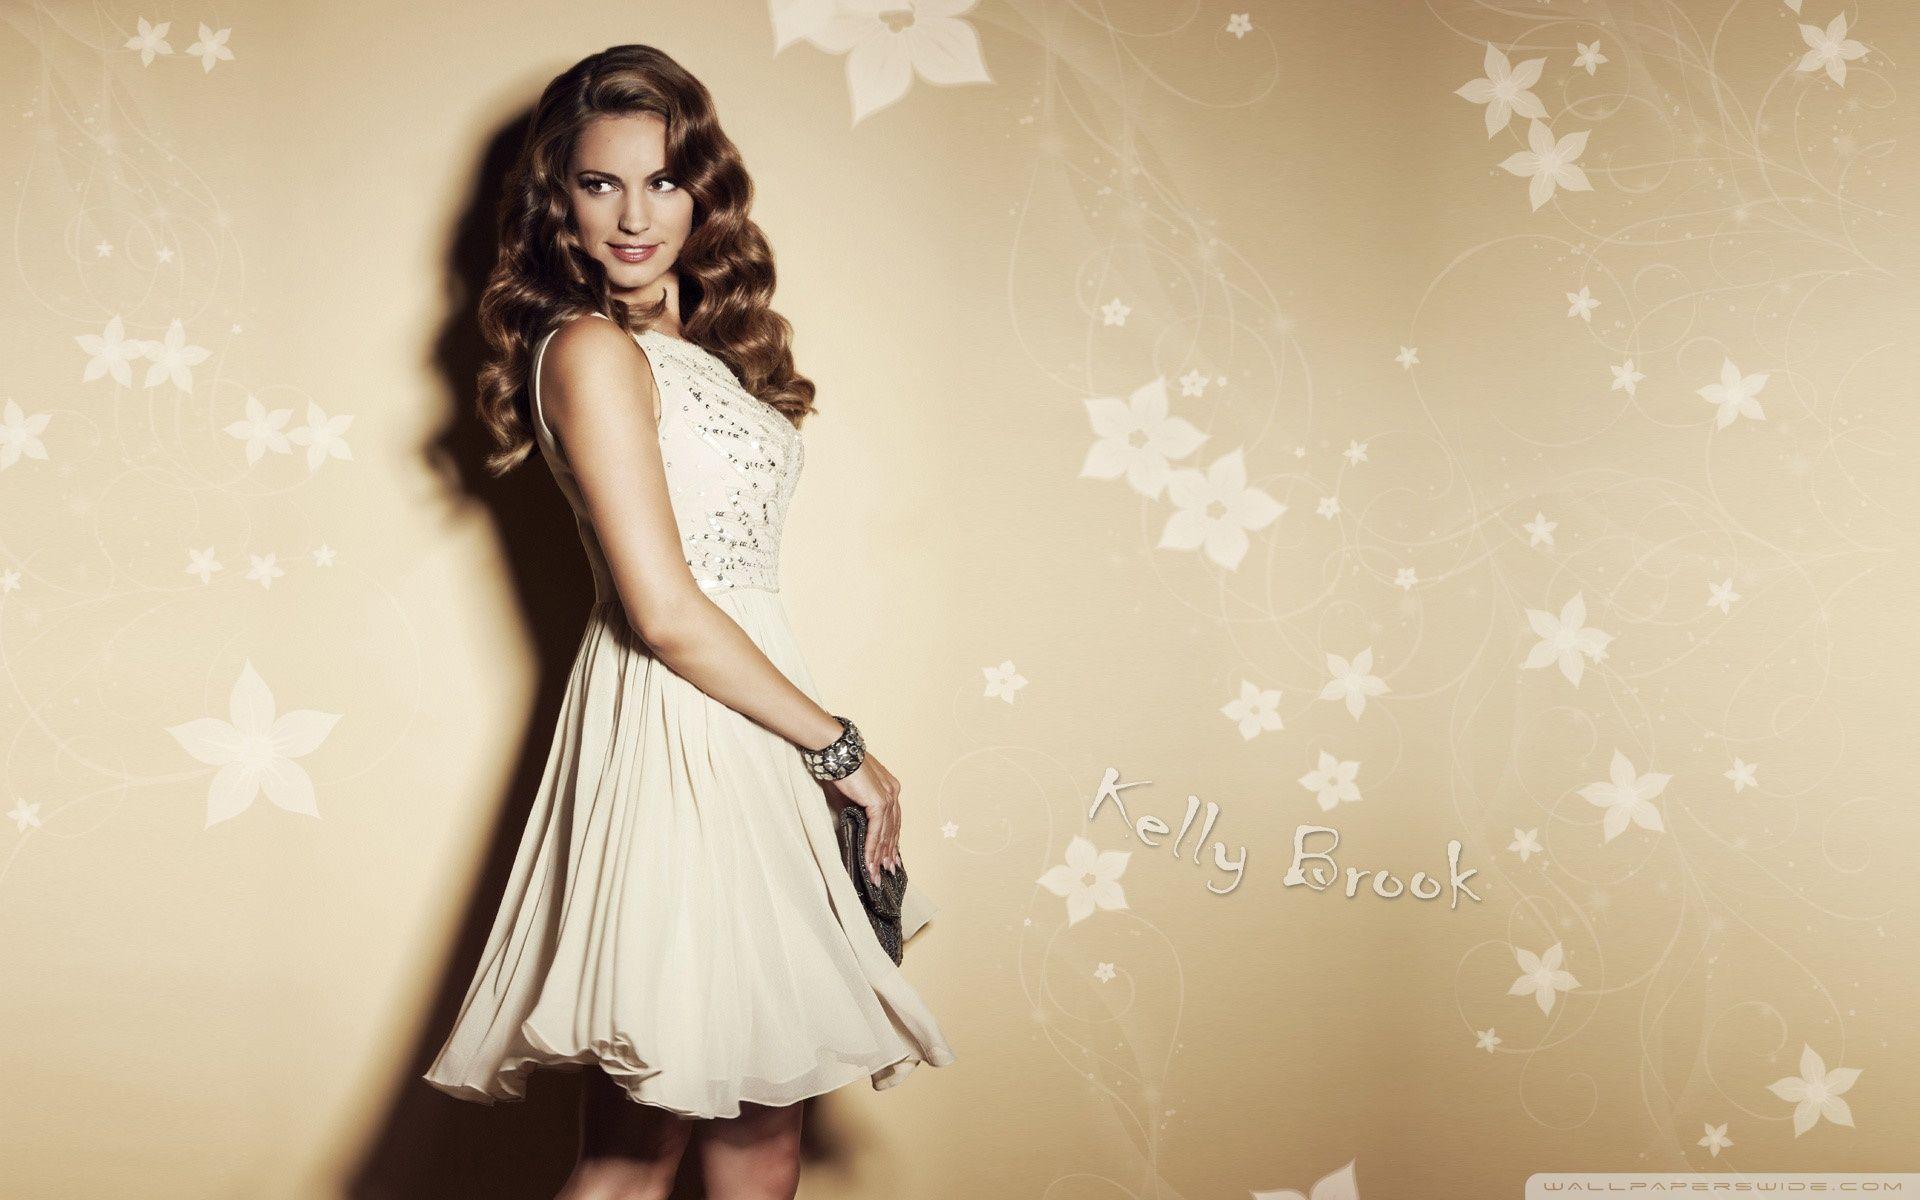 kelly brook hd wallpaper - photo #17